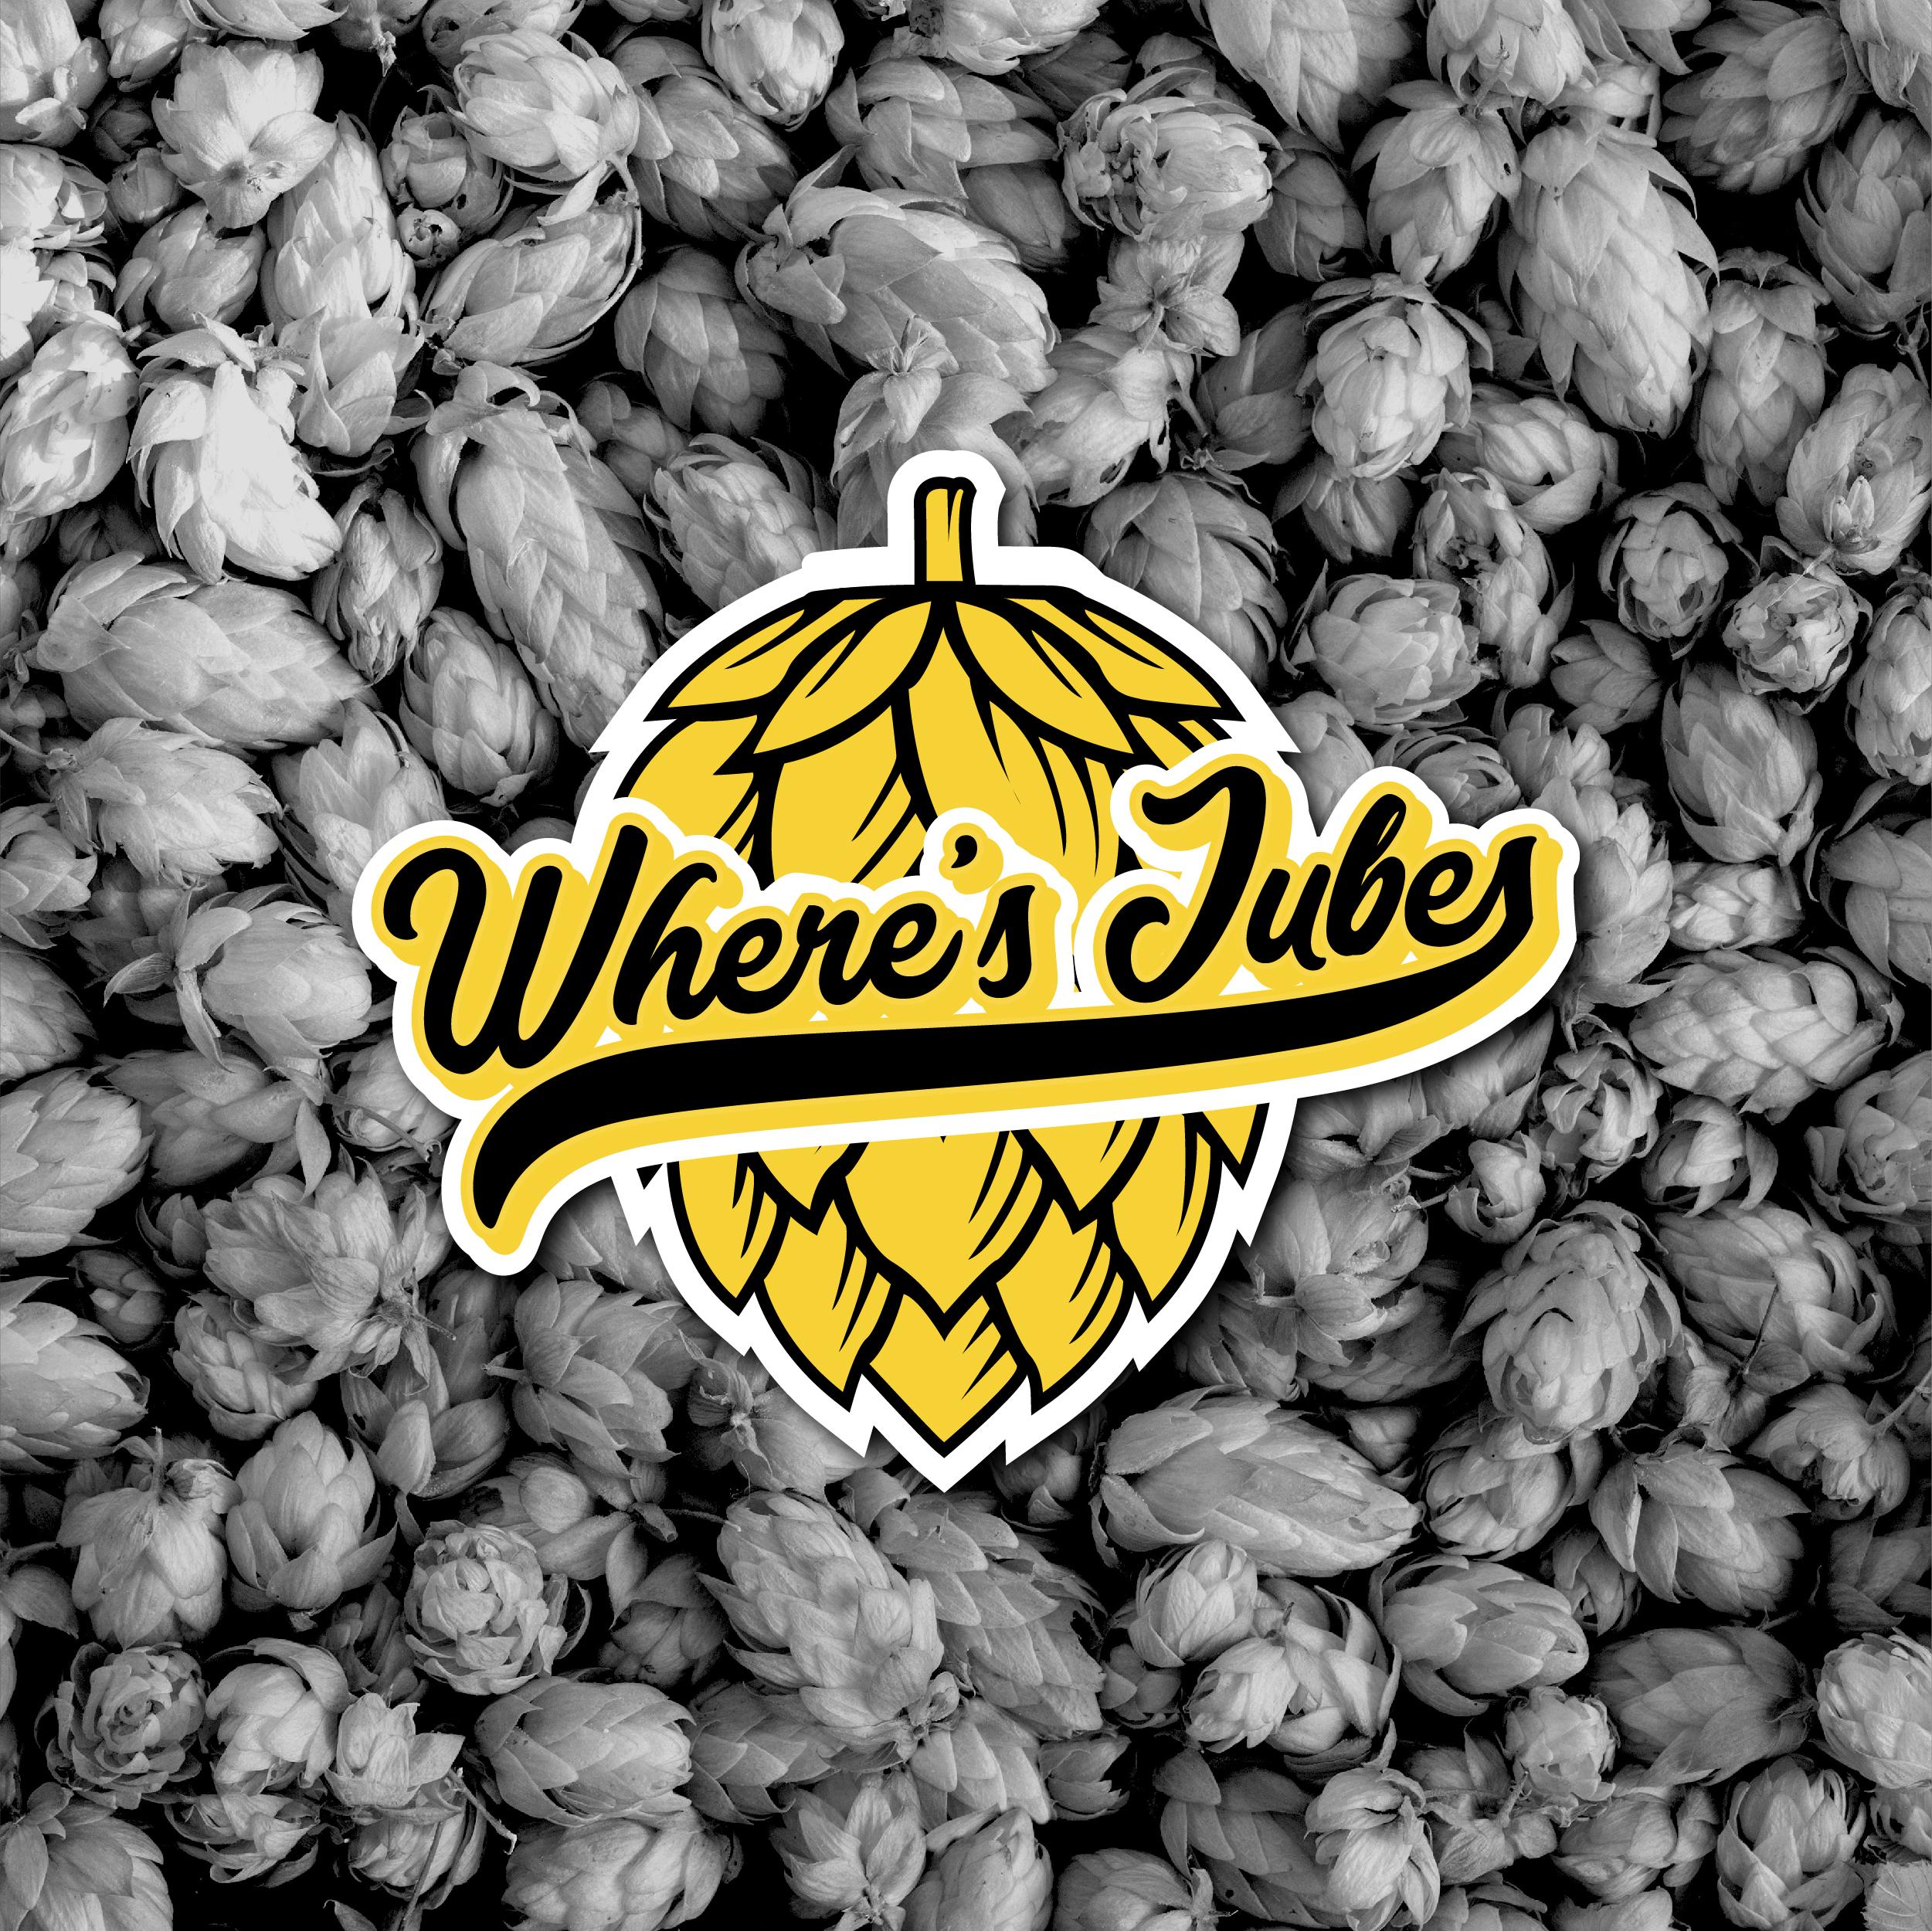 Where's Jubes launch logo